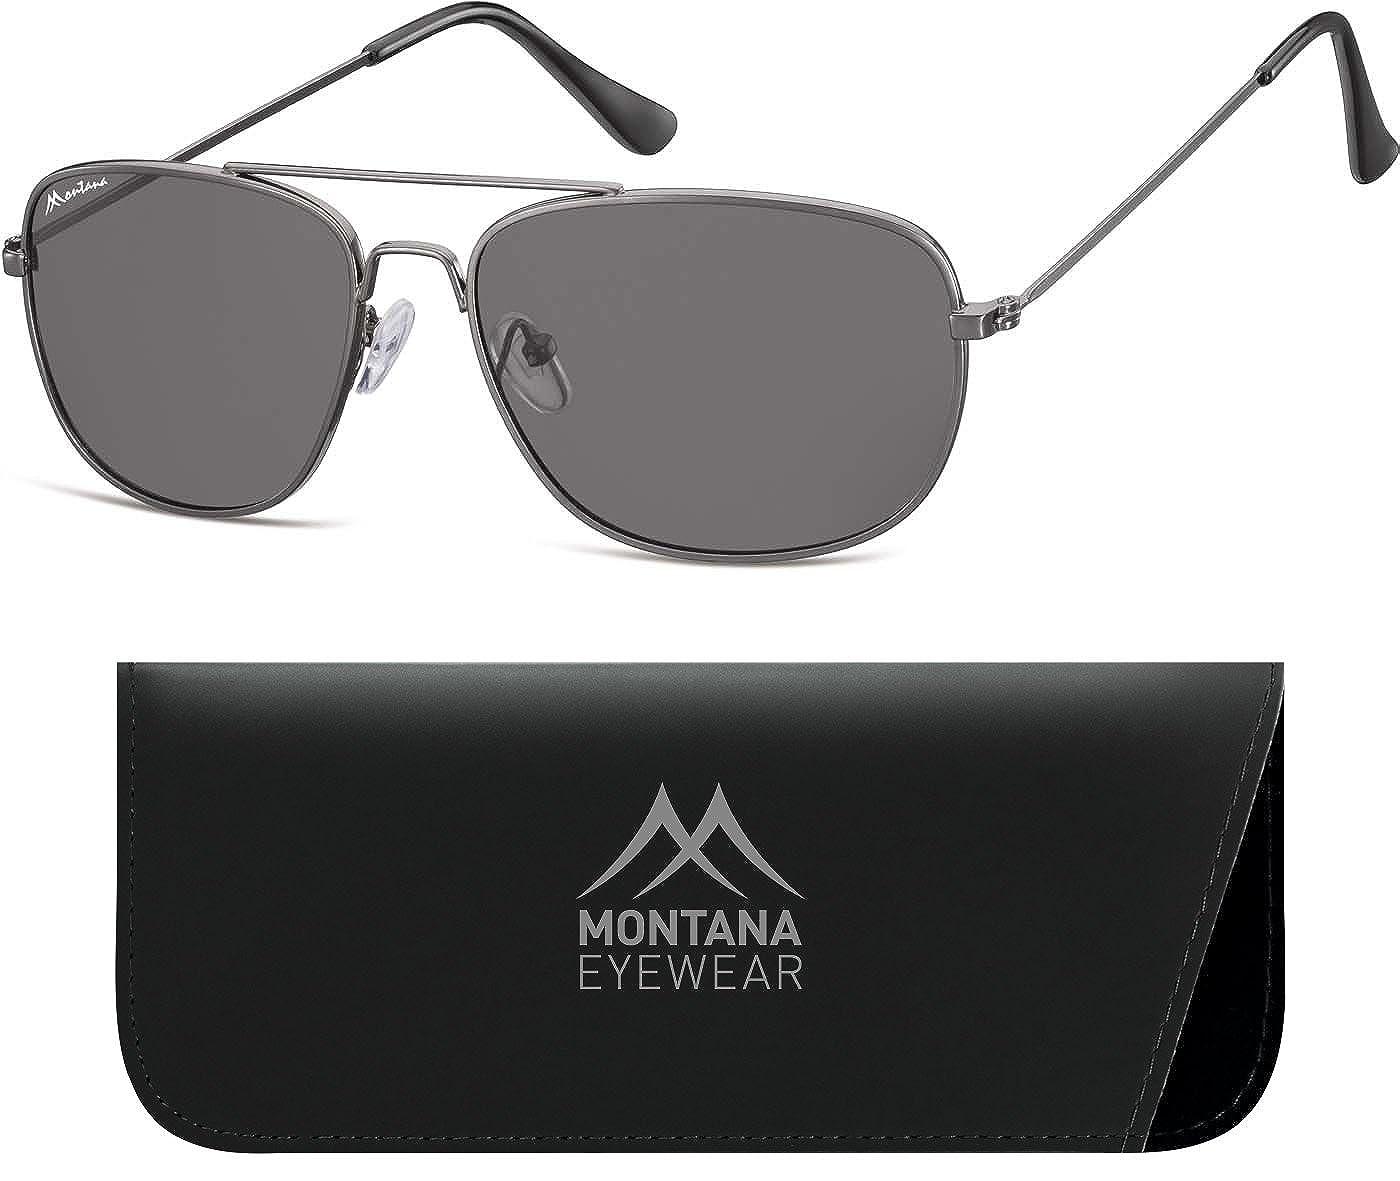 TALLA Talla única. Montana gafas de sol Unisex Adulto